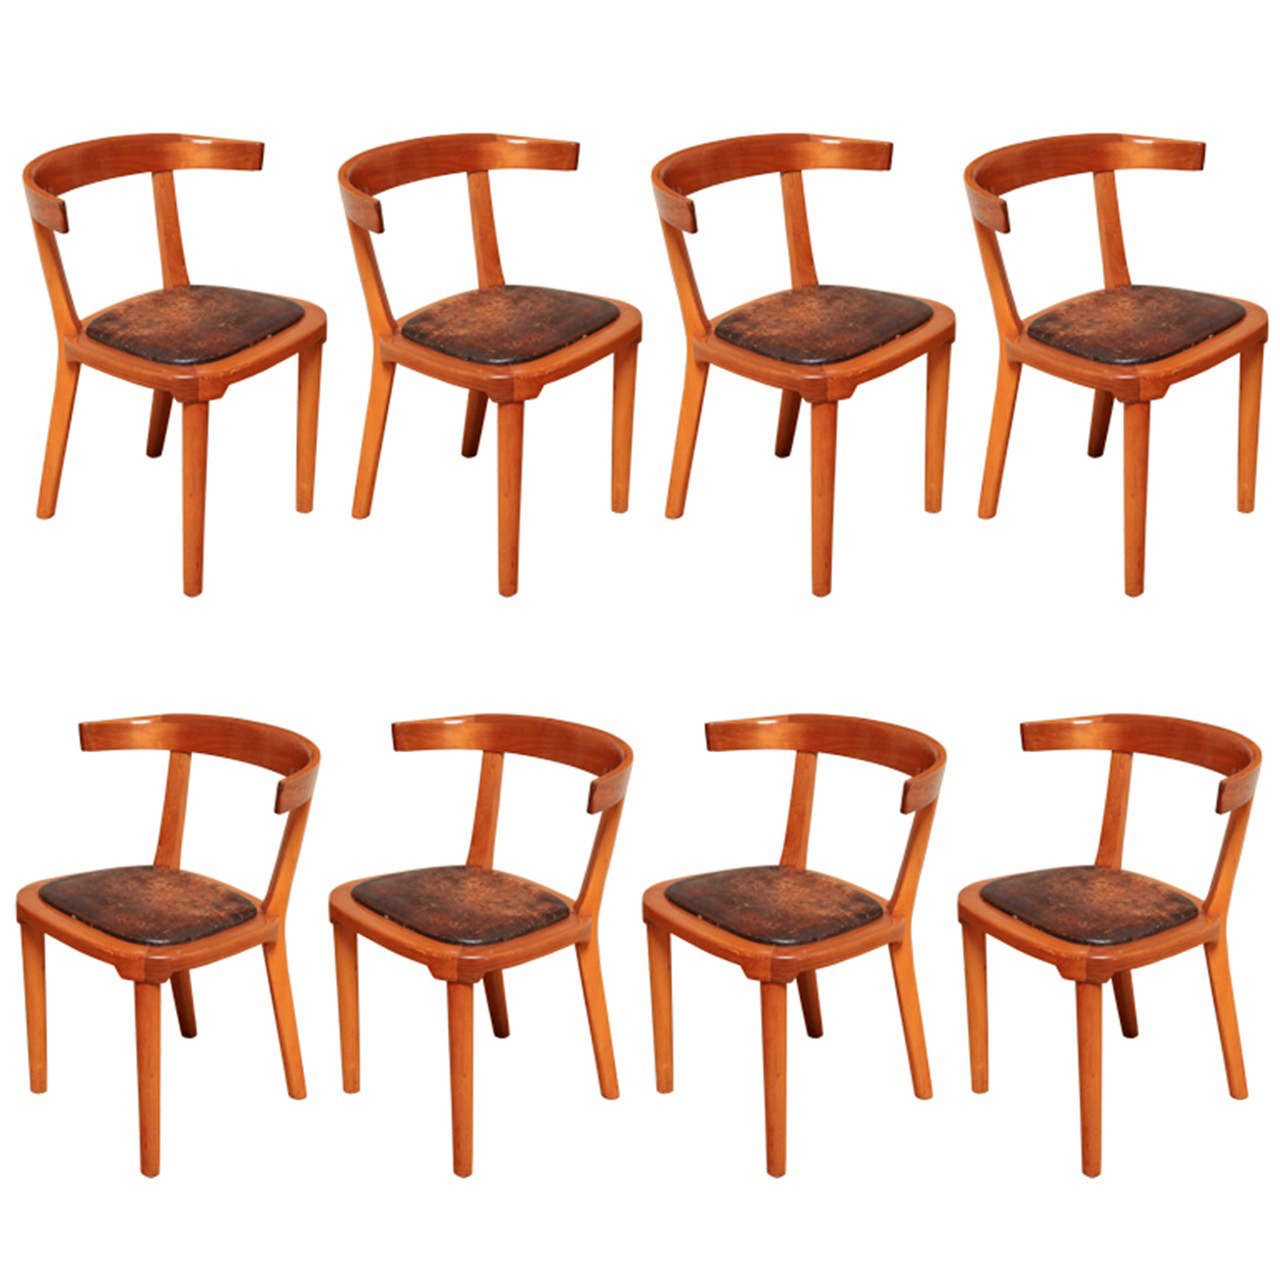 Unique Set Of 8 Dining Chairs Designed By Gunnar Asplund